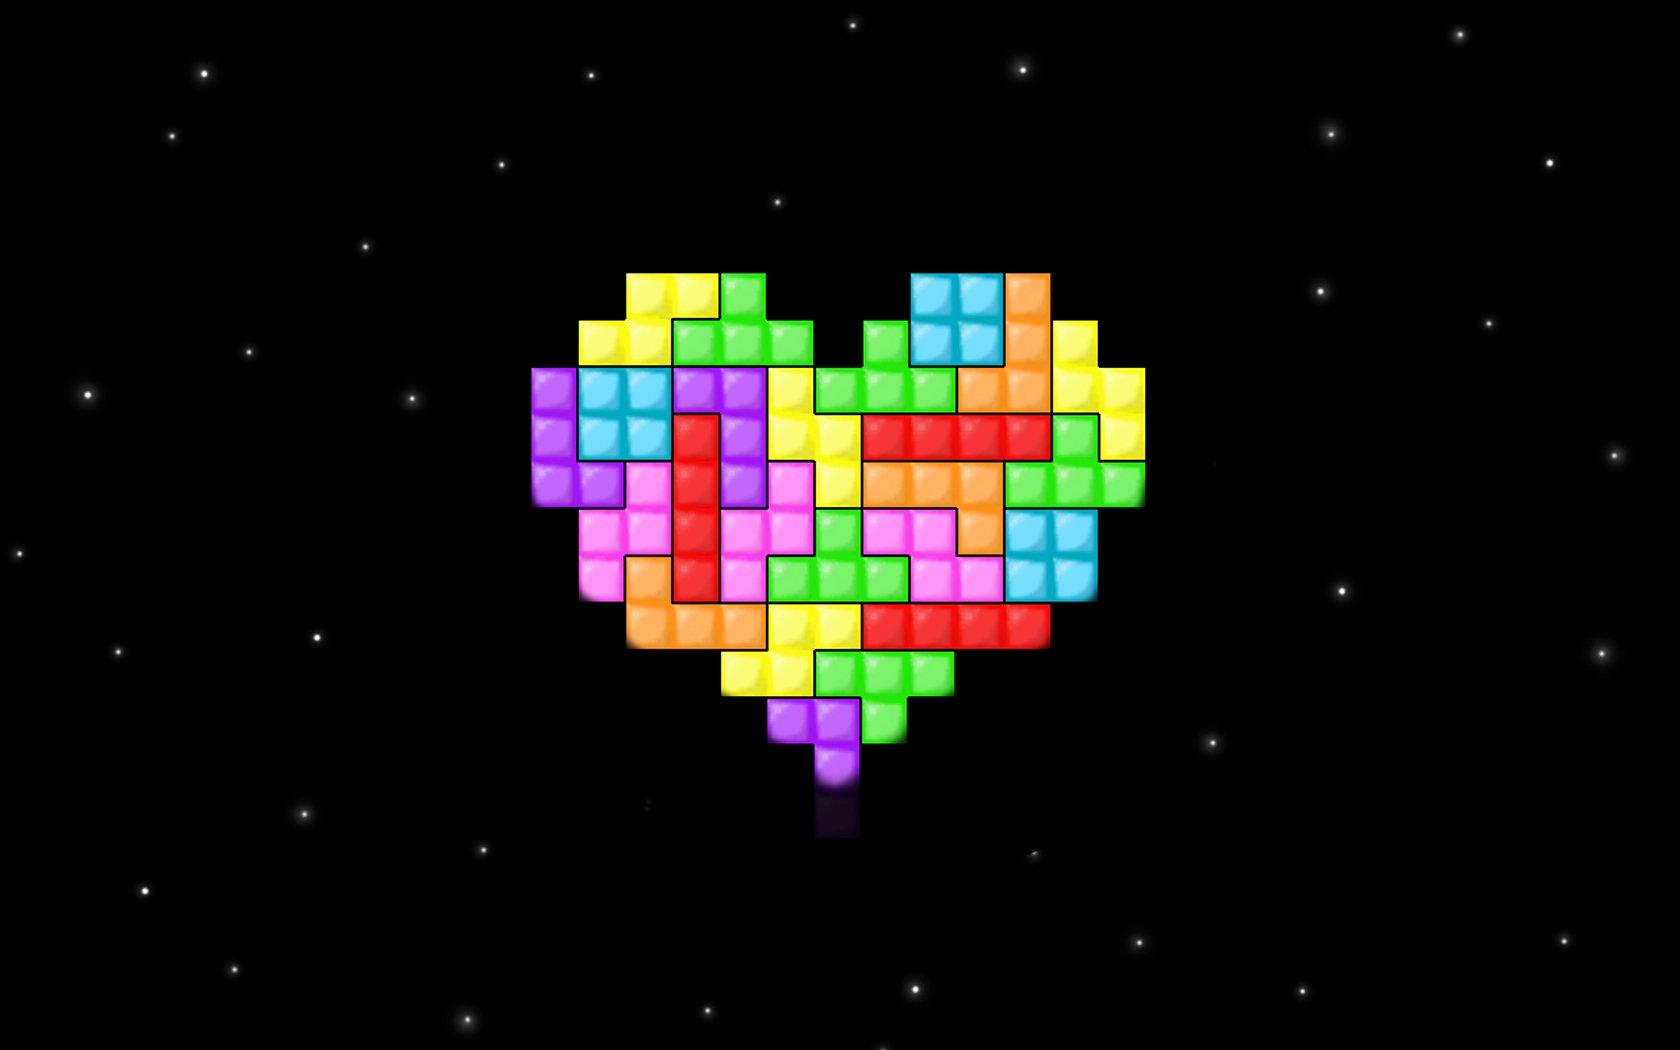 Tetris Wallpaper And Hintergrund 1680x1050 Id333857 Wallpaper